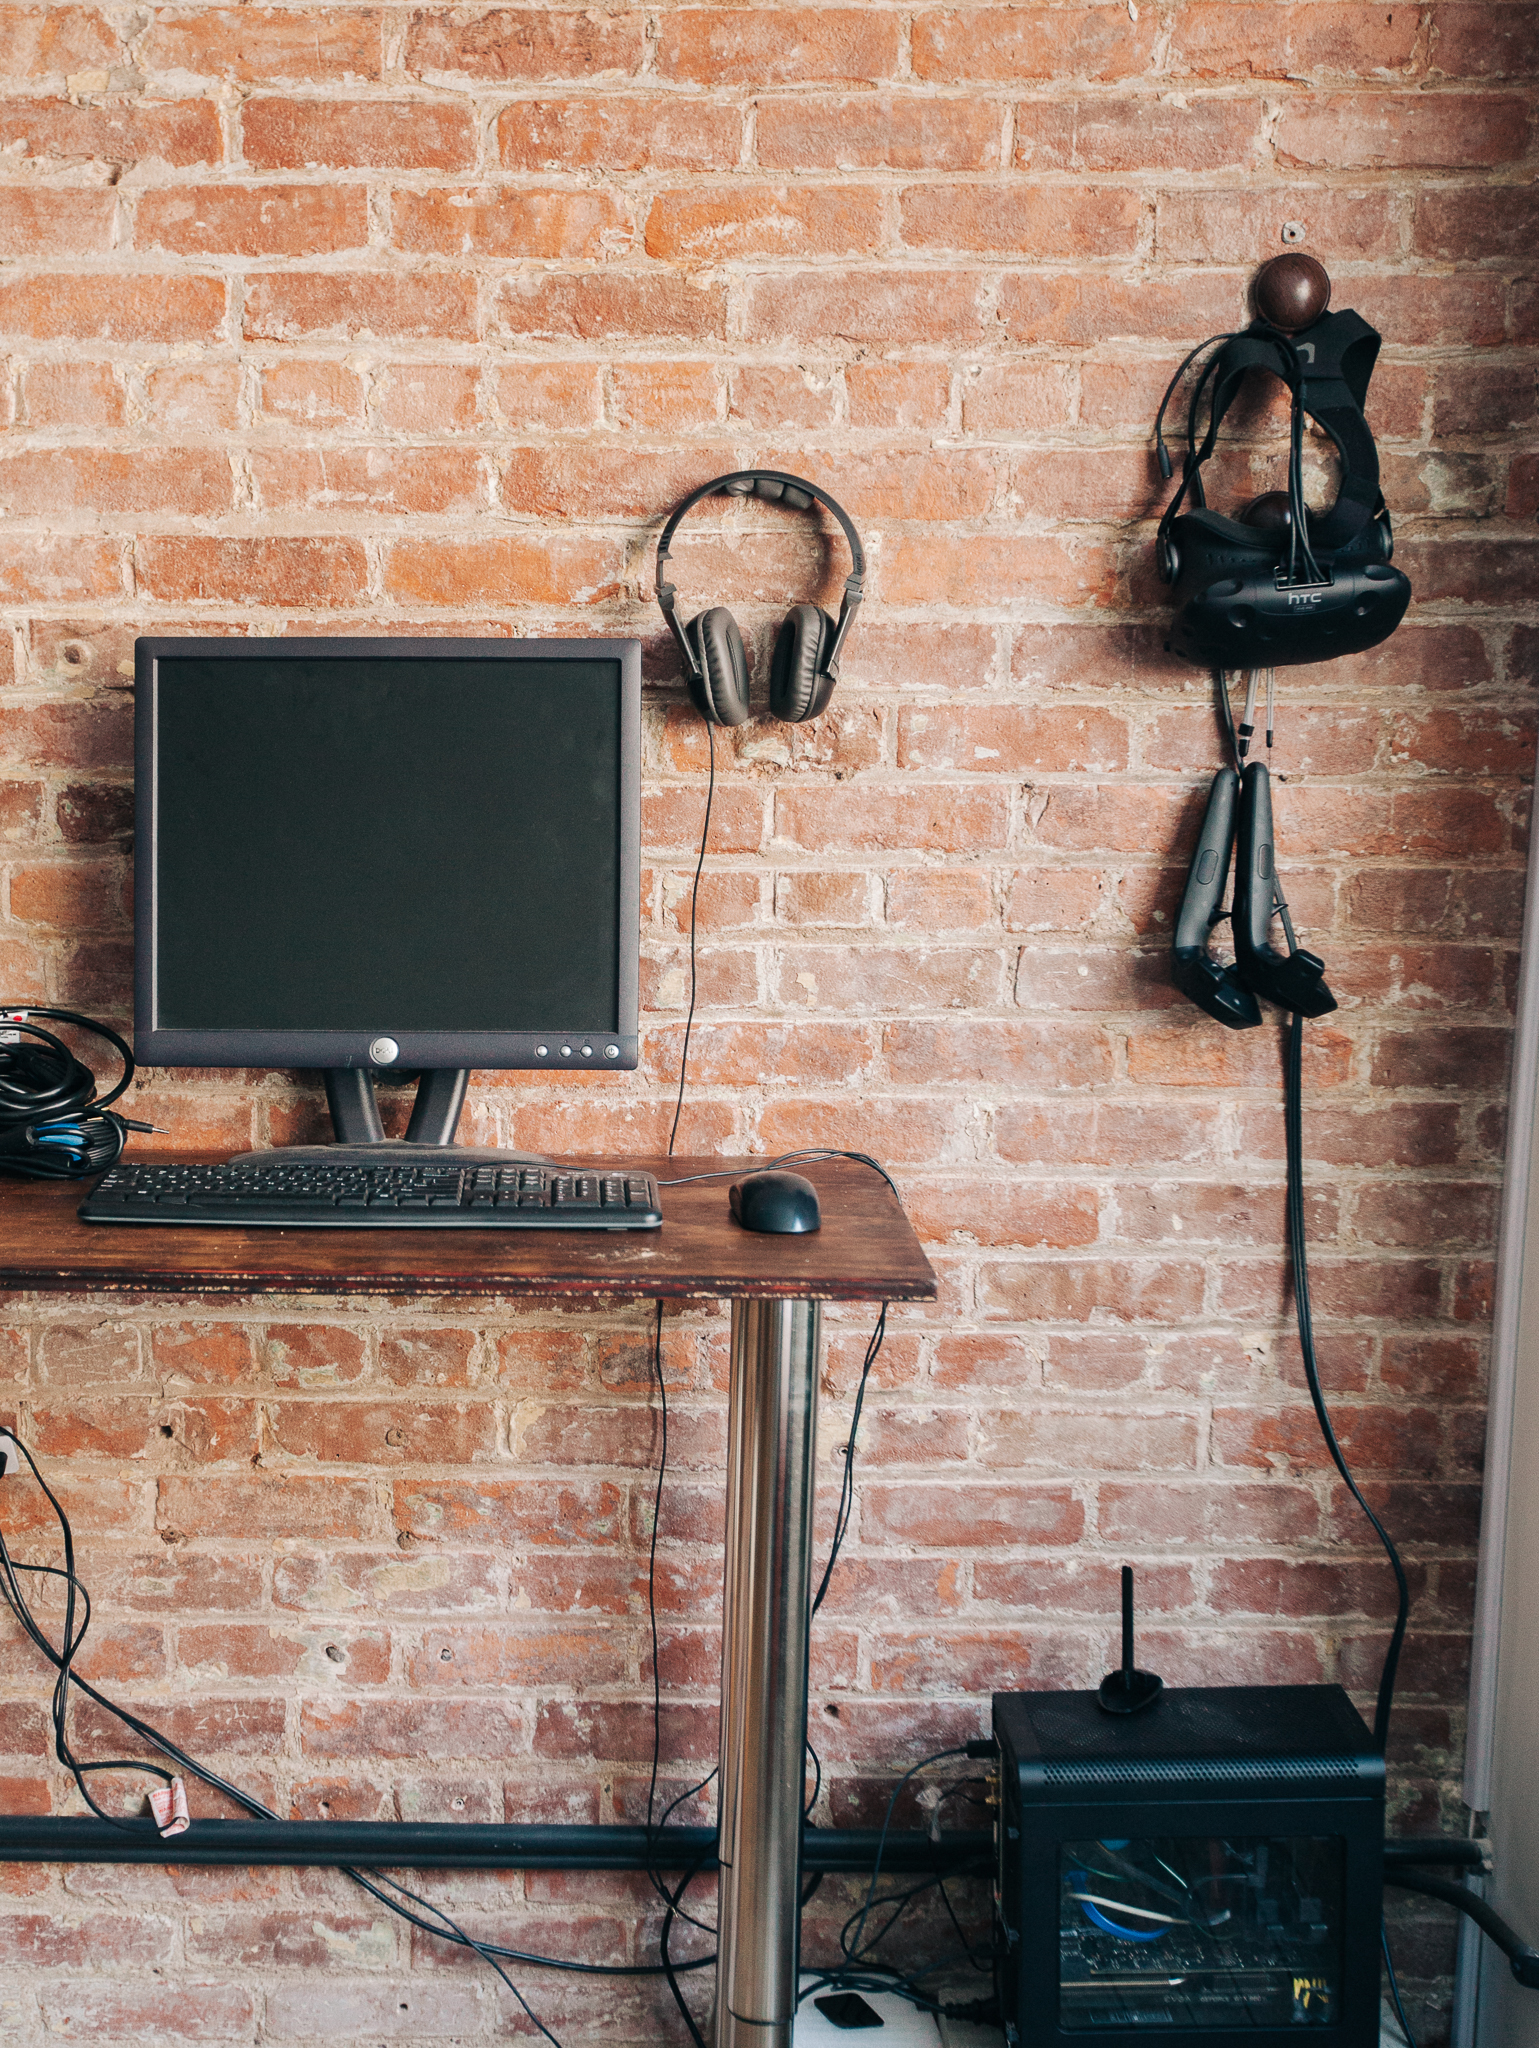 VR Demo PC  (Custom build / i5-6500 / 8gb DDR4 / GTX980 Ti / SSD / Windows 10 Home)